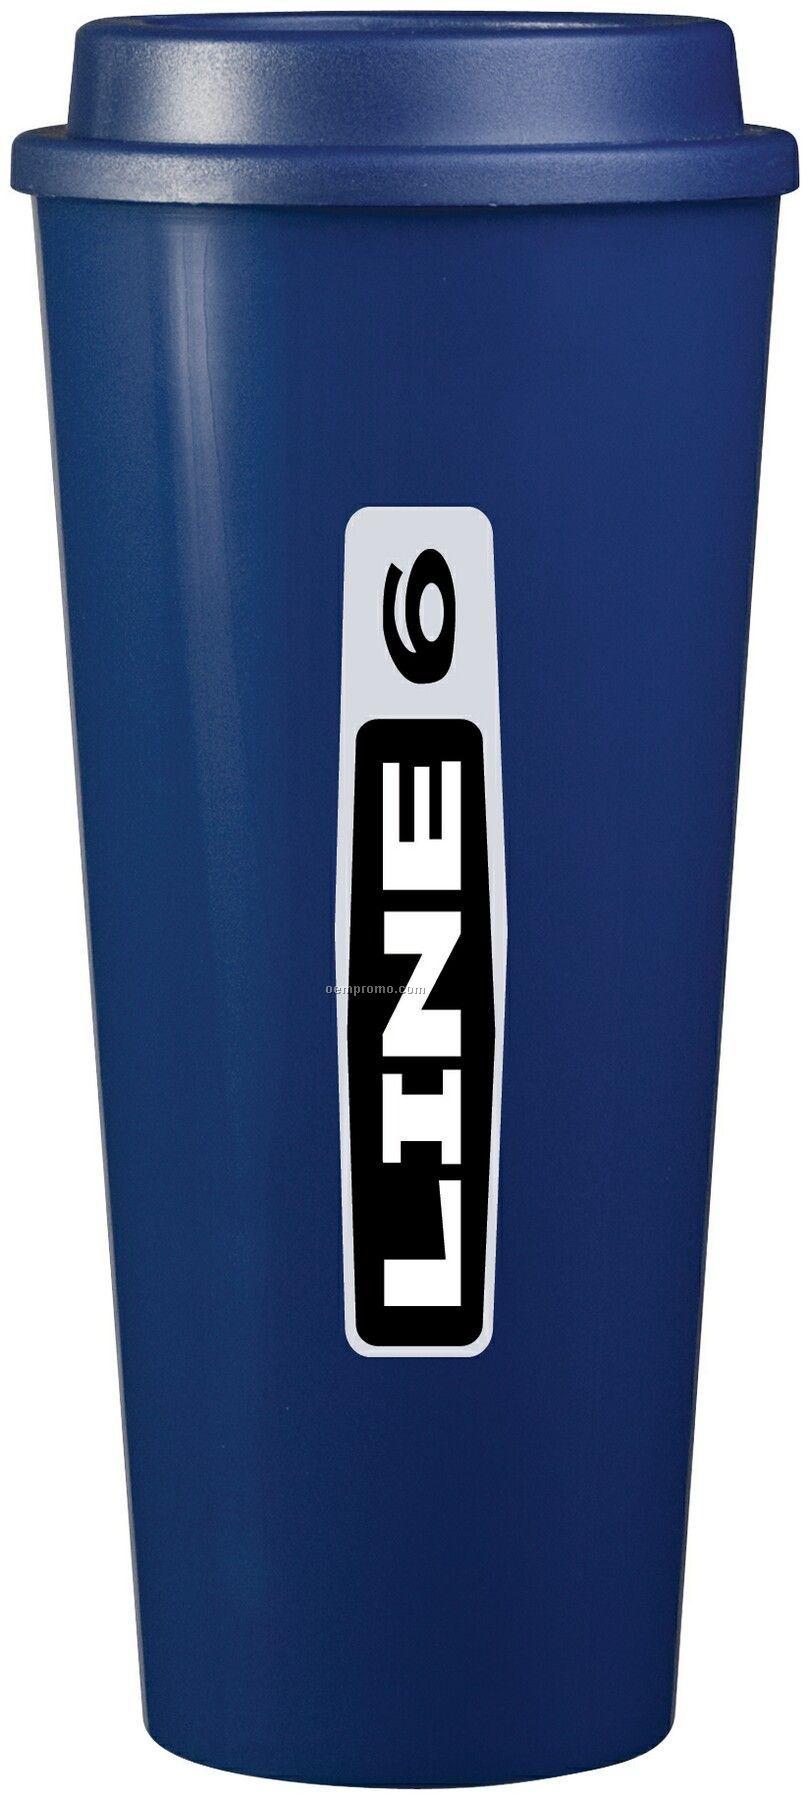 20 Oz. Blue Plastic Cup2go Cup